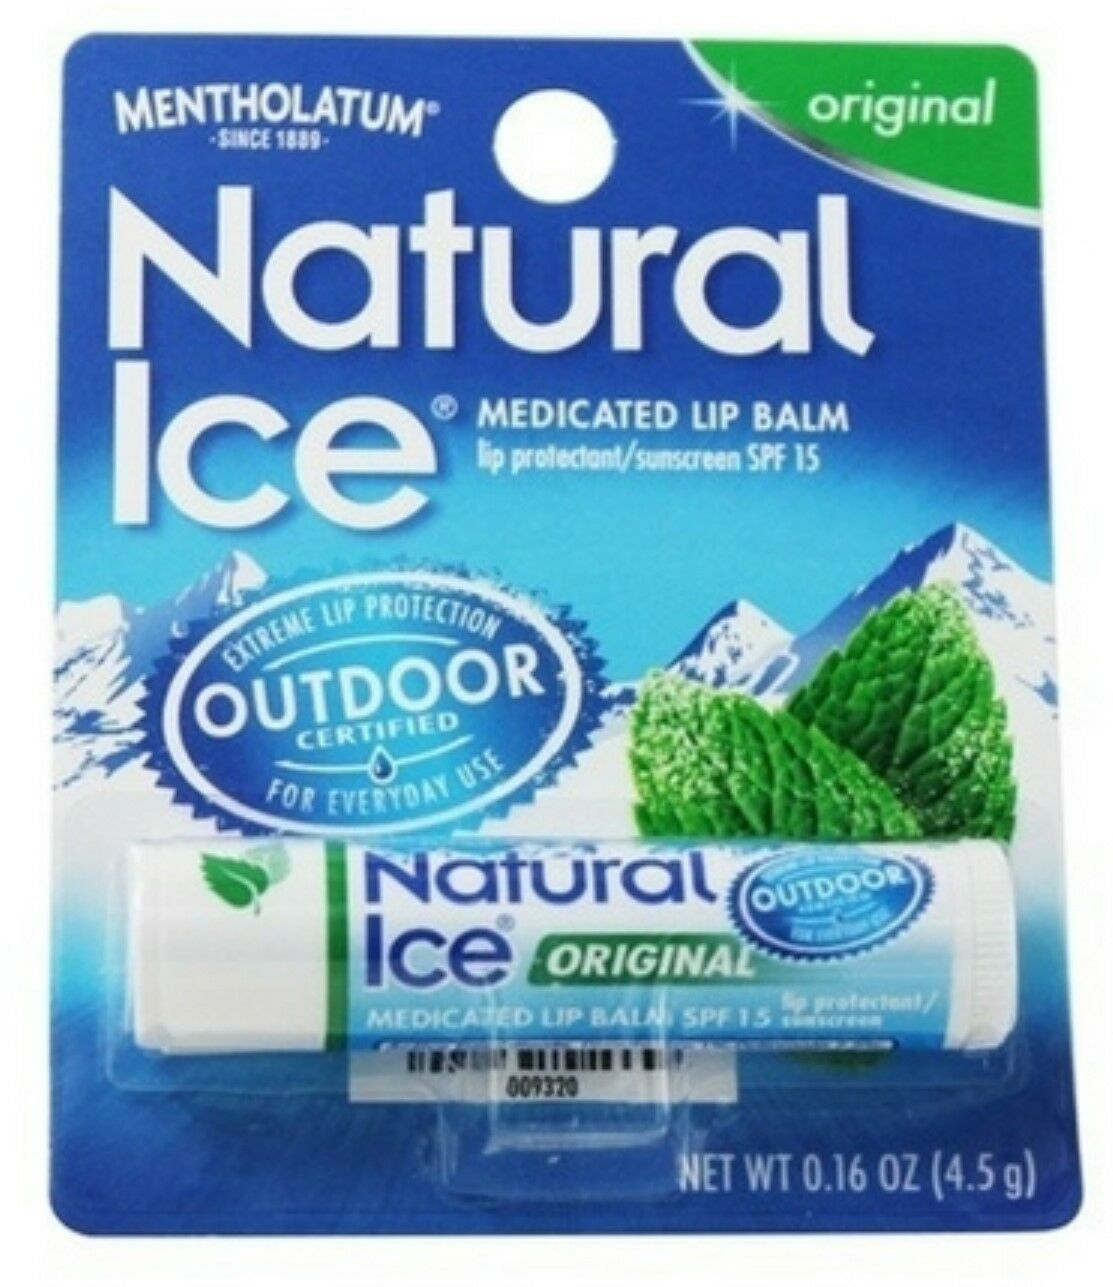 Mentholatum Natural Ice Lip Balm Original SPF 15 1 Each SanRe Organic Skinfood - Sweet Lips Soothing Lip Balm - 0.25 oz. (pack of 6)